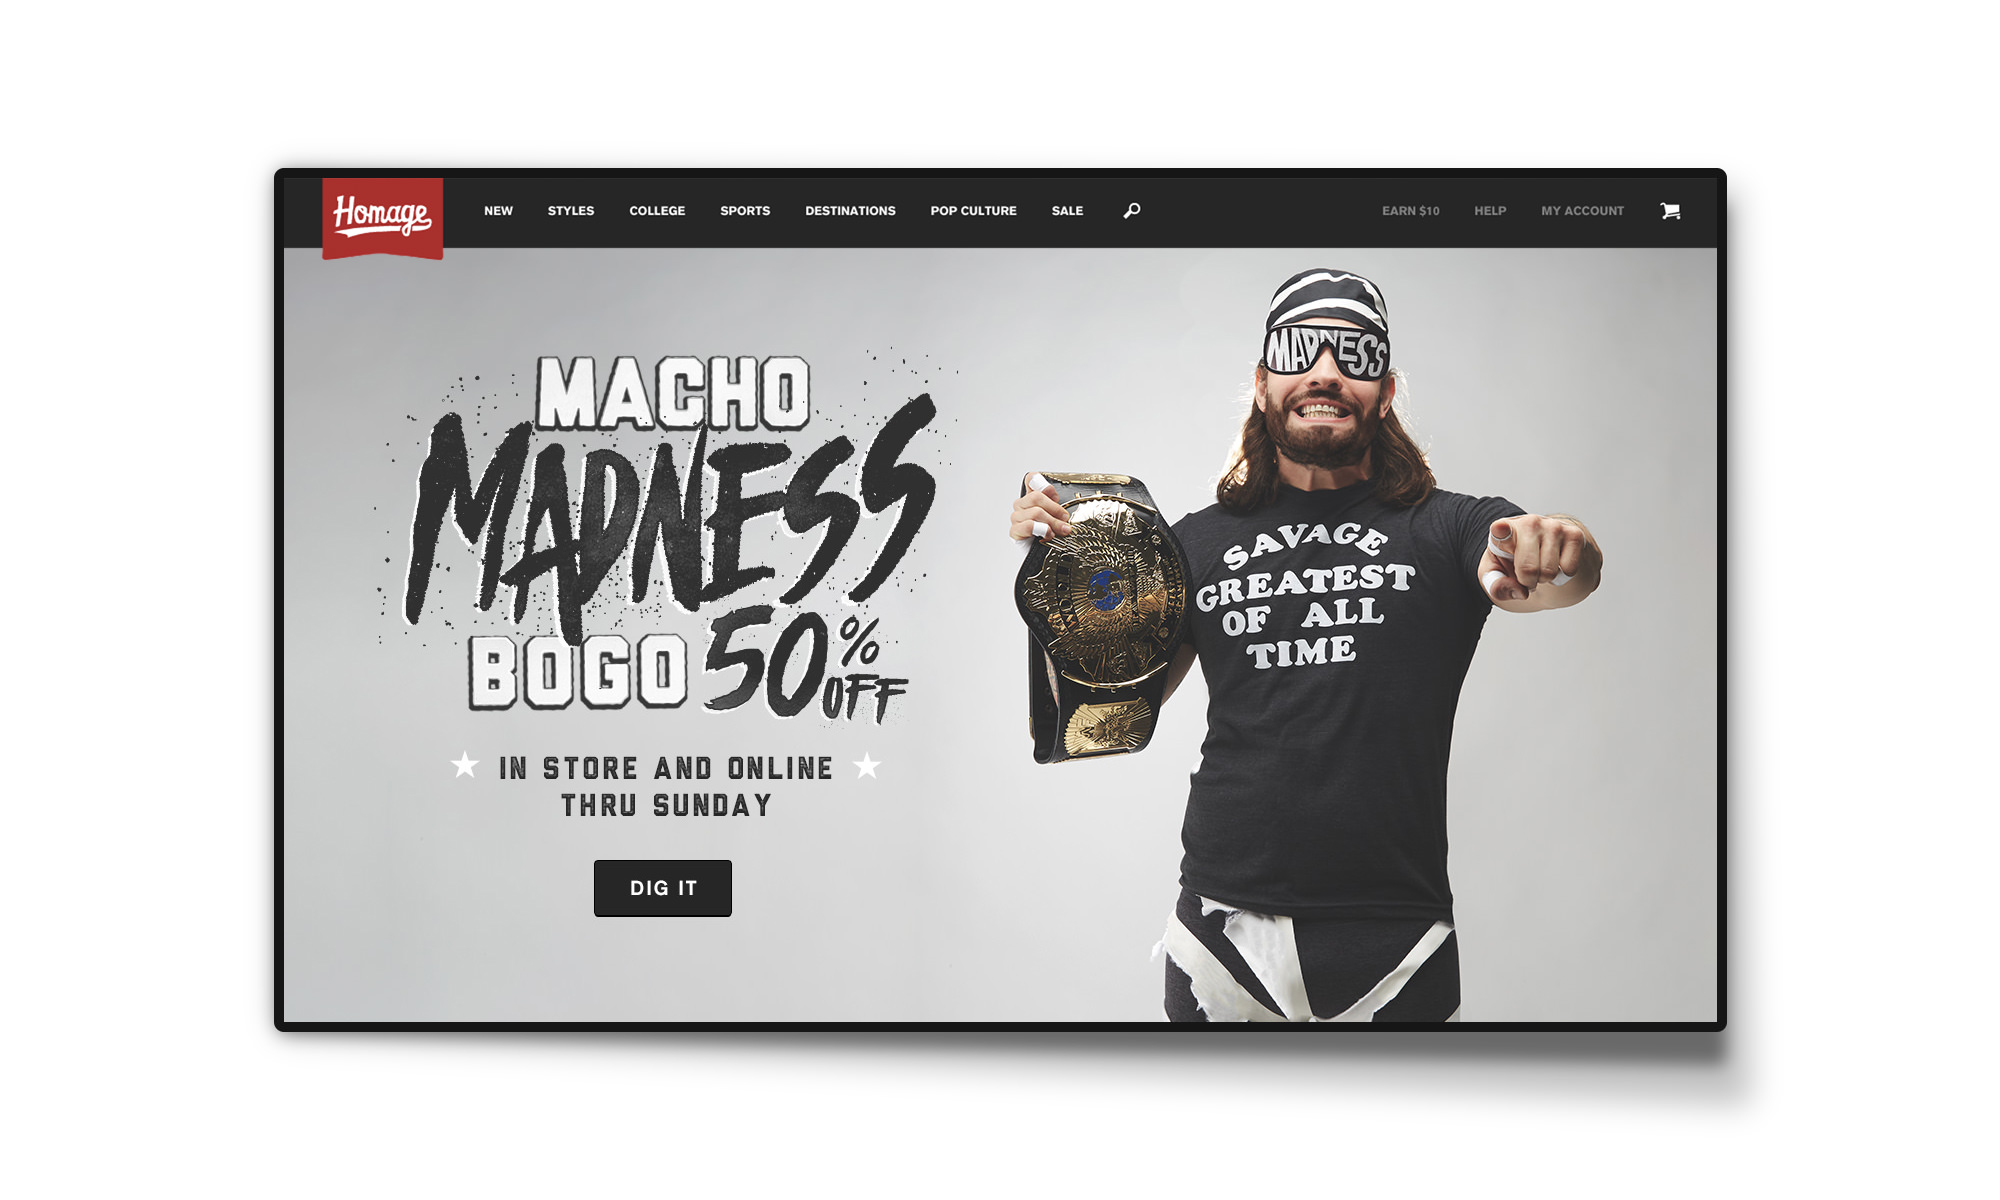 macho-madness-bw-desktop.jpg